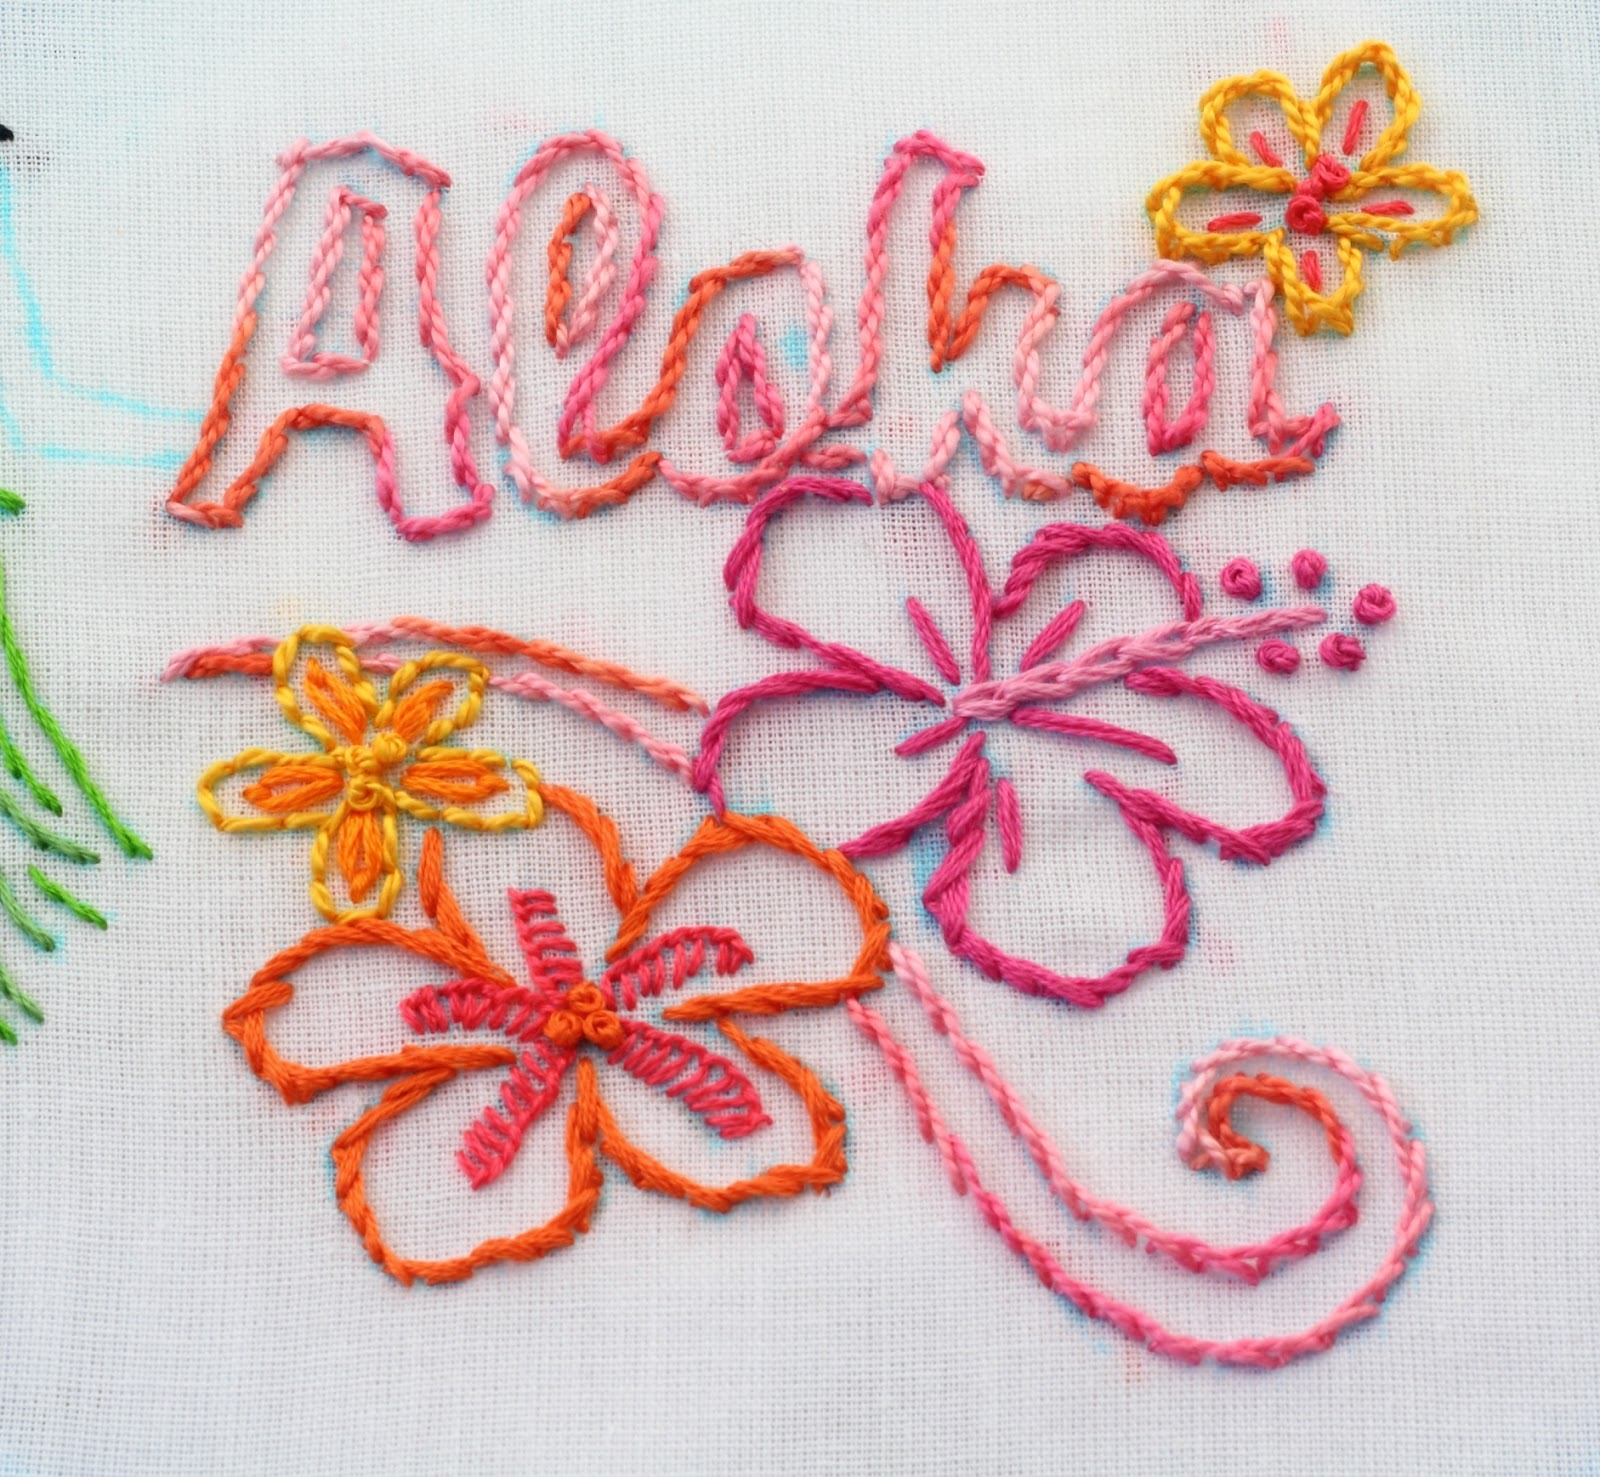 Big b hawaii embroidery pattern